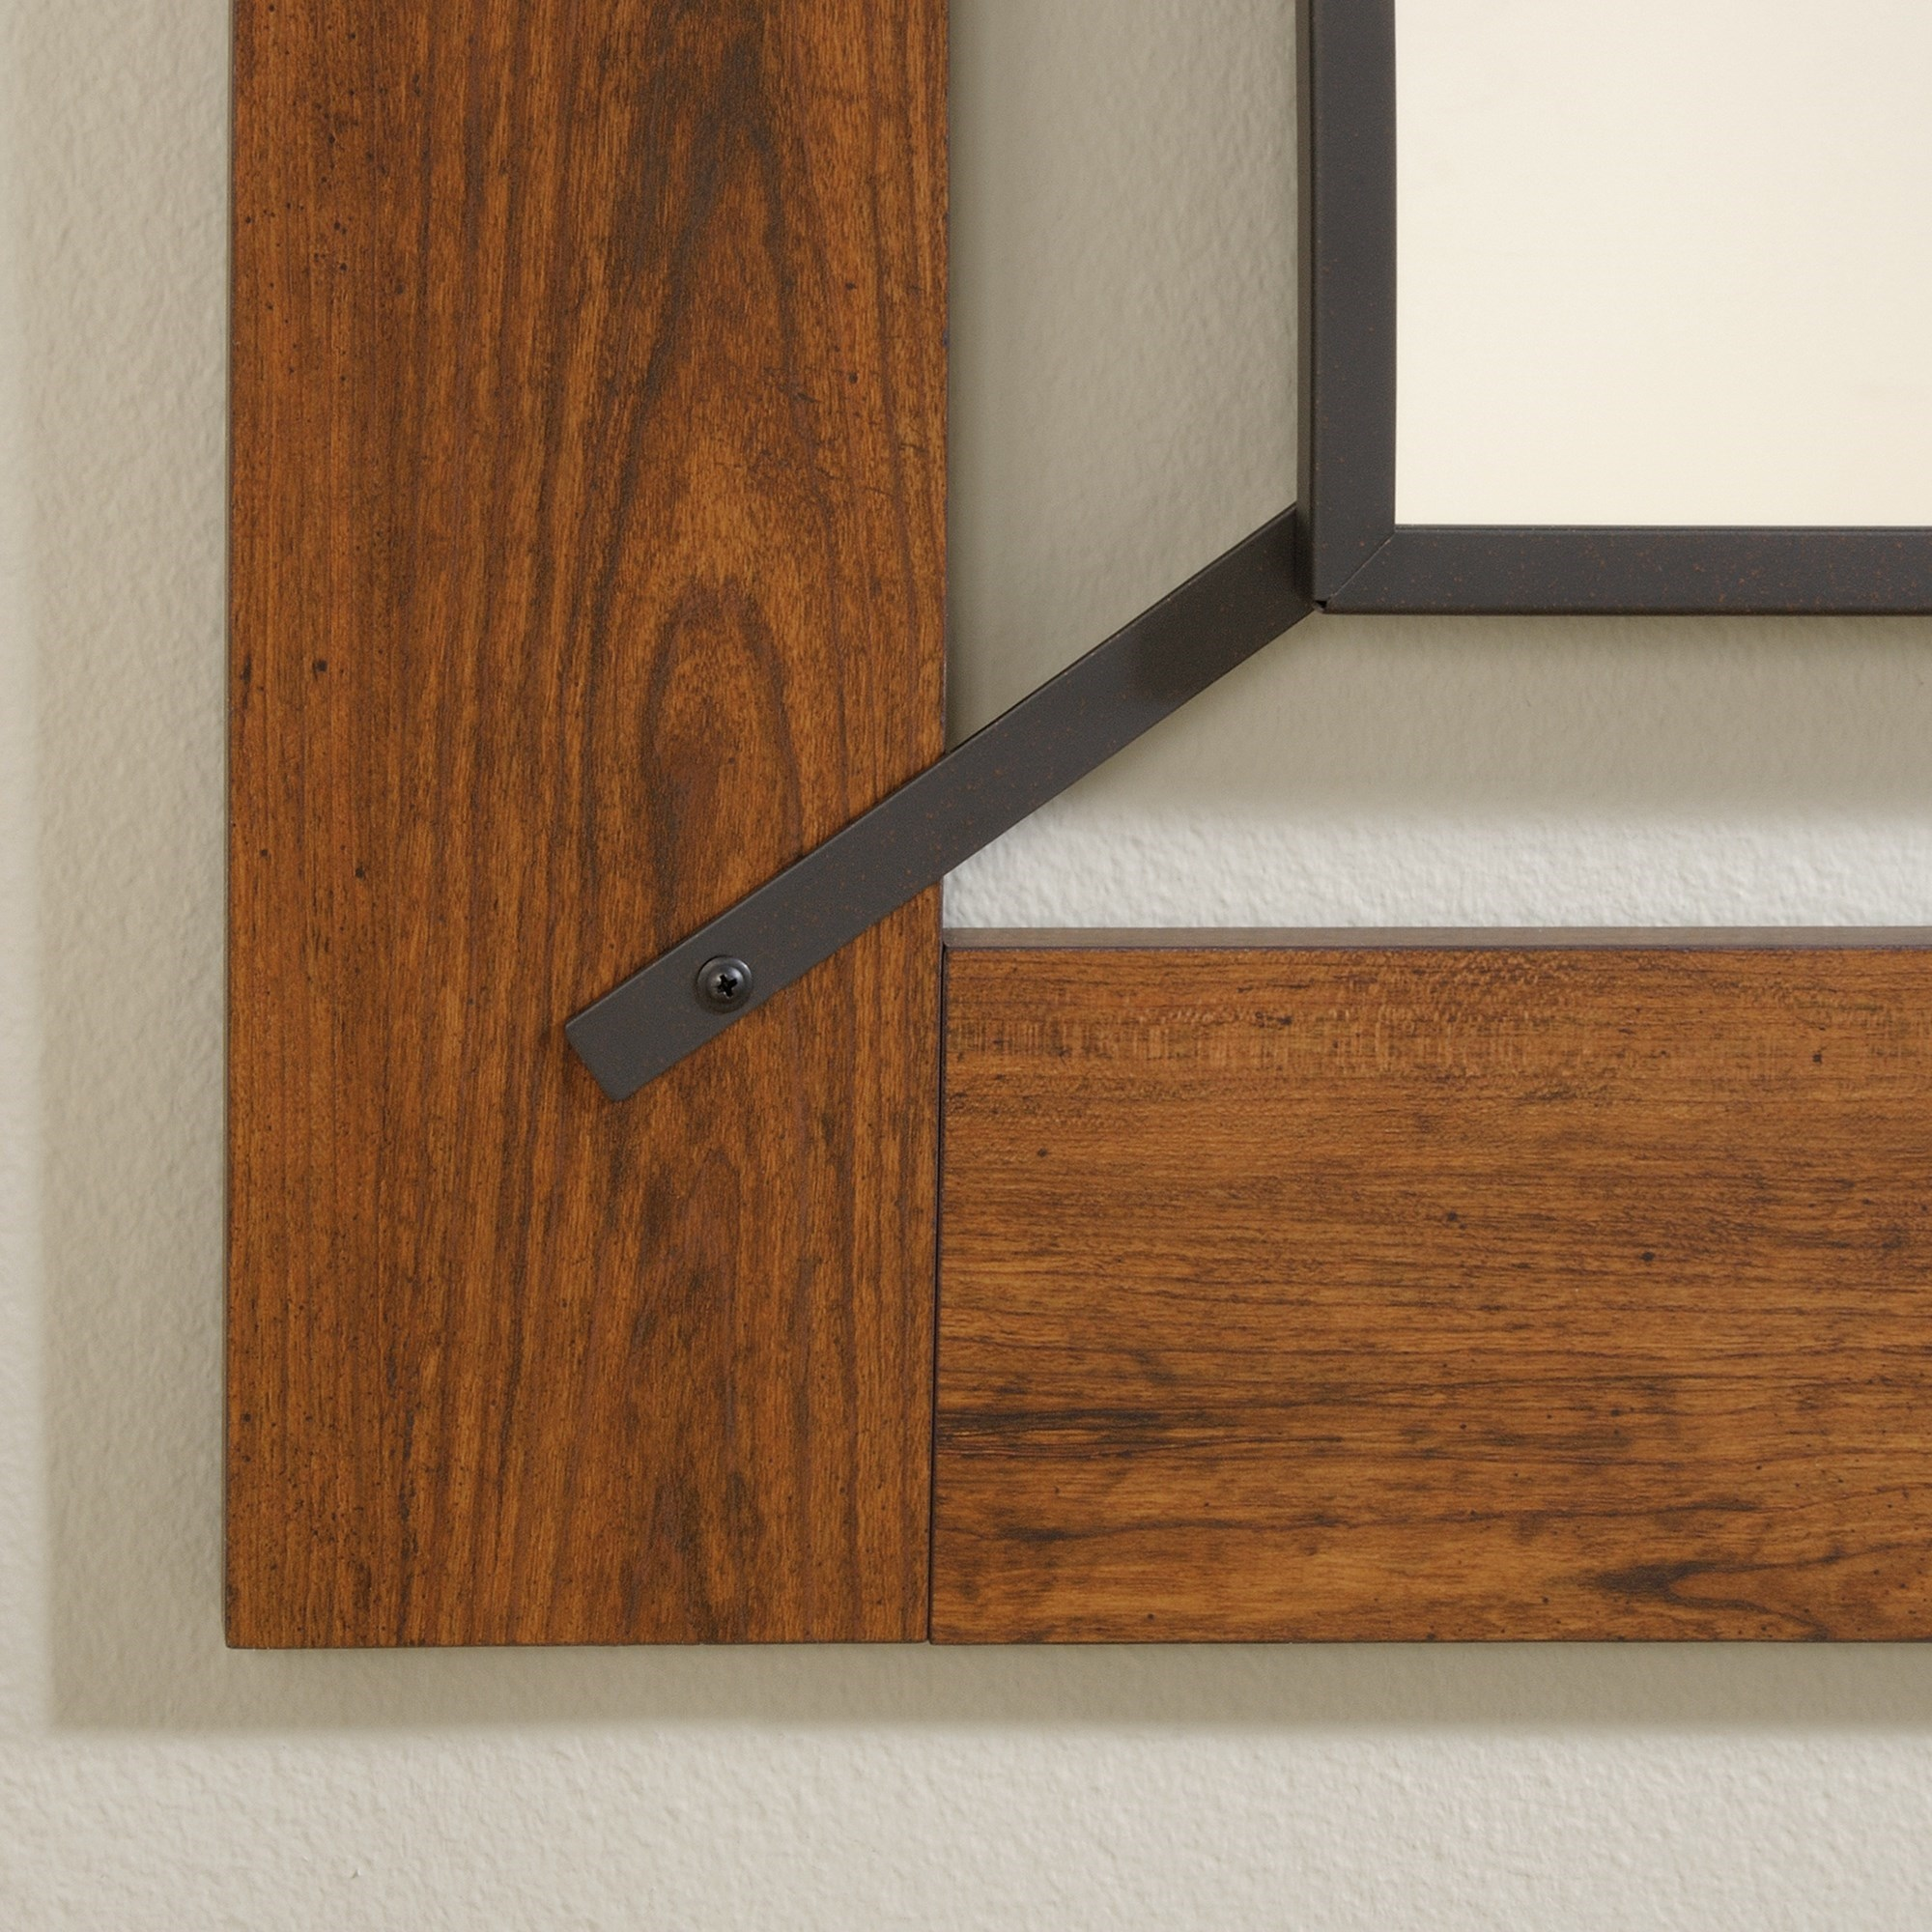 Sauder Carson Forge 415556 Mirror John V Schultz Furniture Wall Mirrors